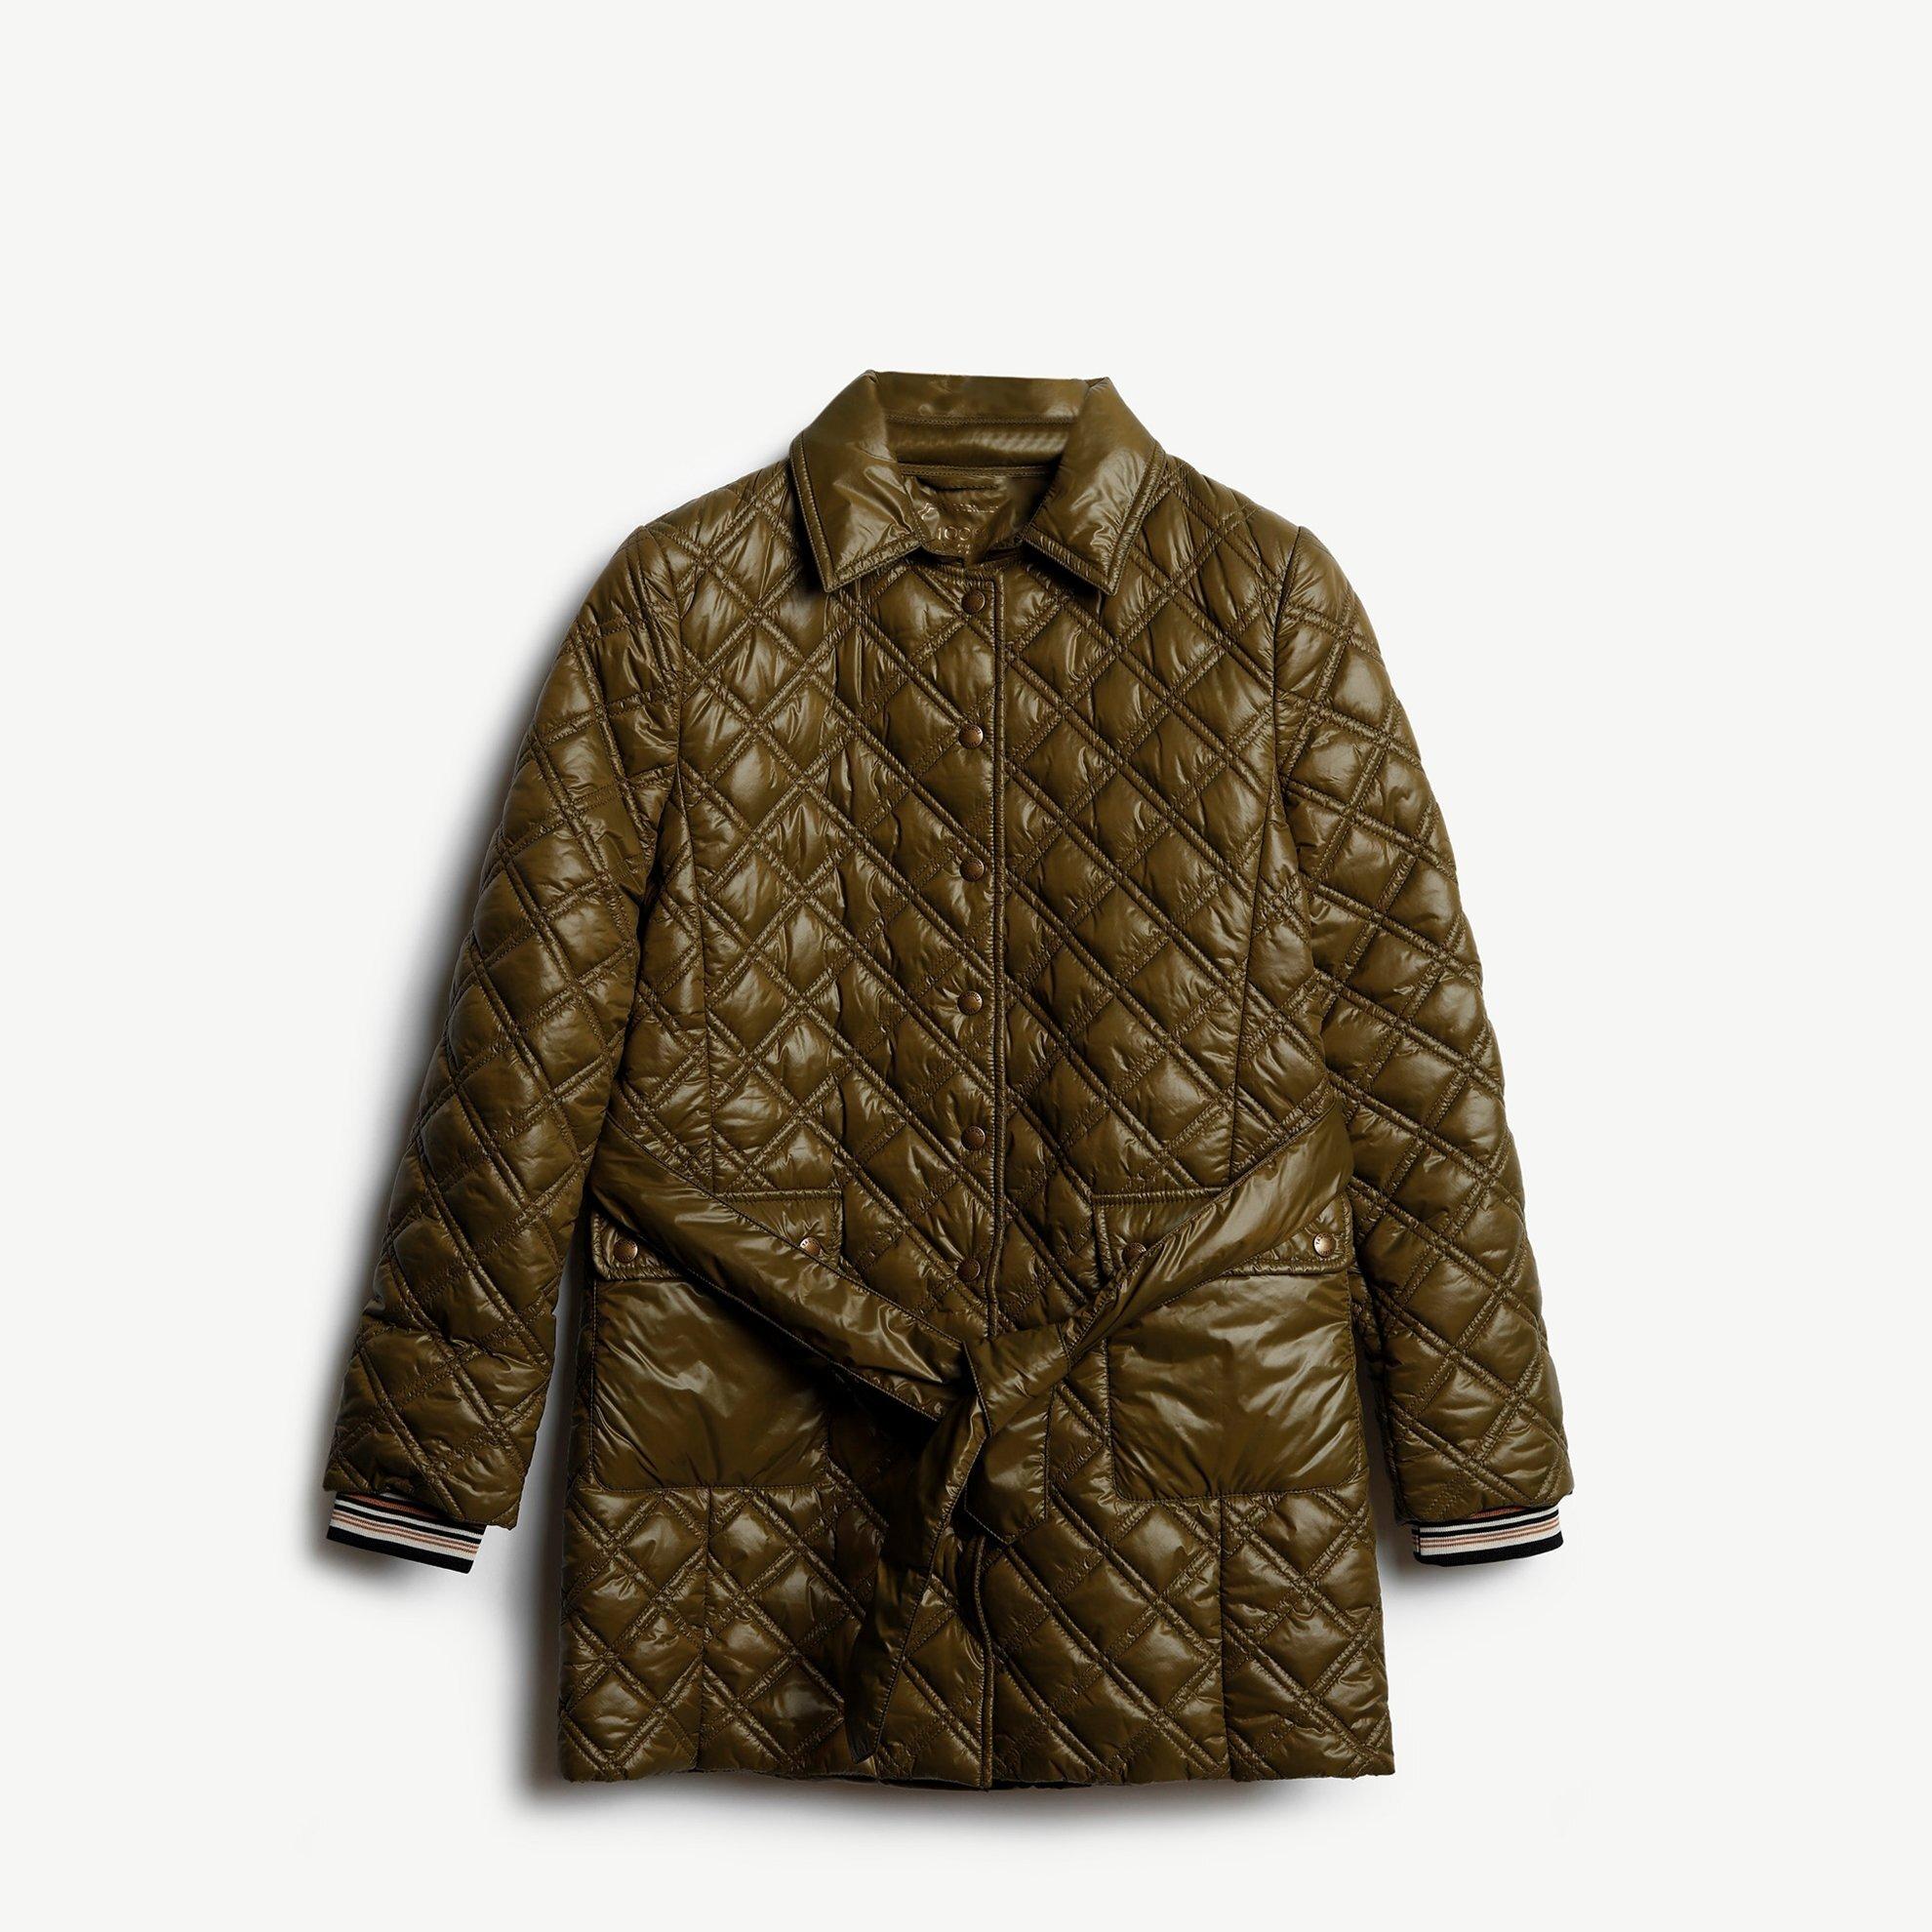 Mantel aus Mikrofiber